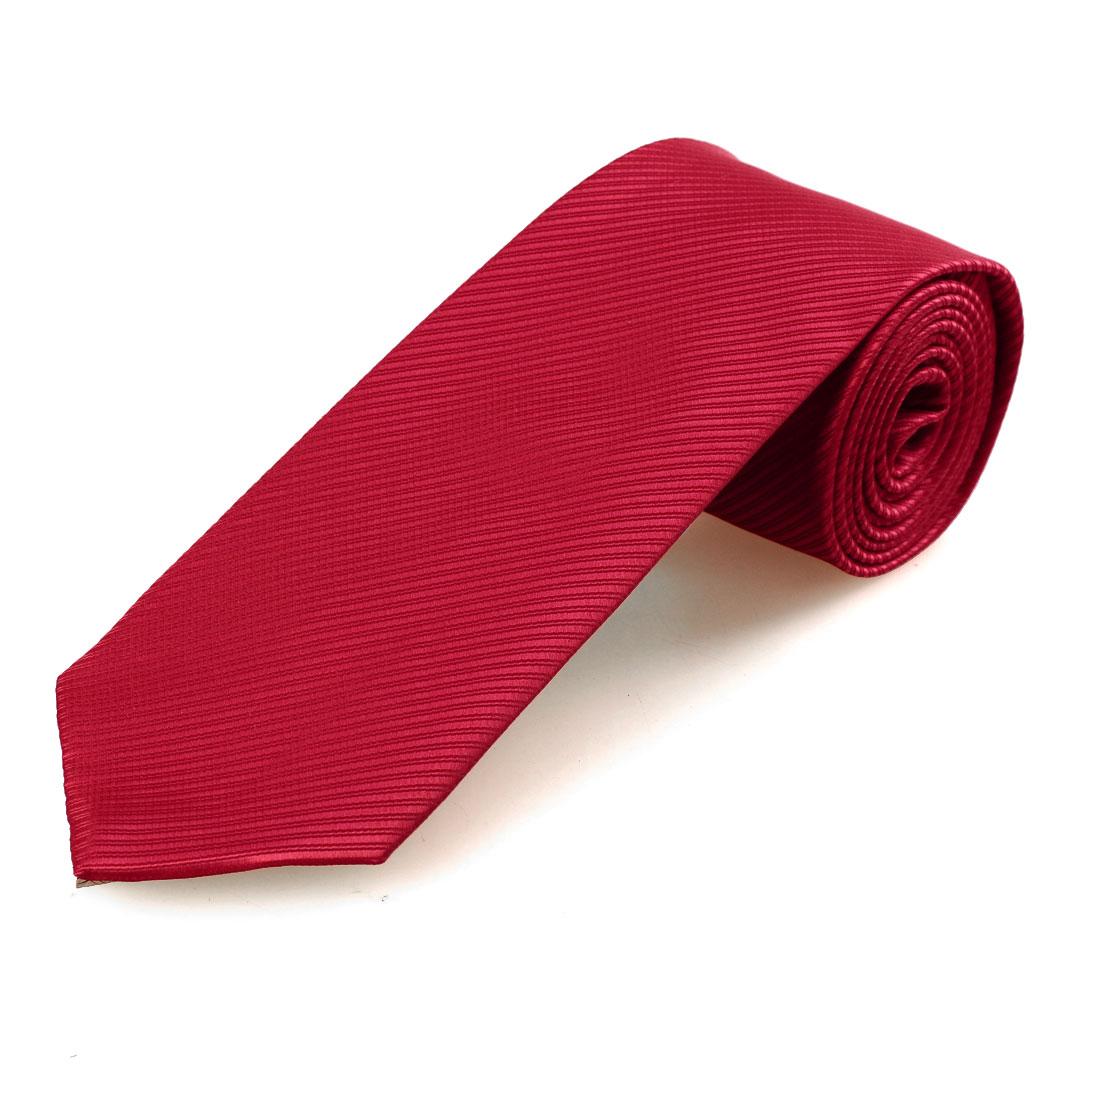 10.5cm Wide Stripe Print Polyester Self Tie Necktie Red for Men